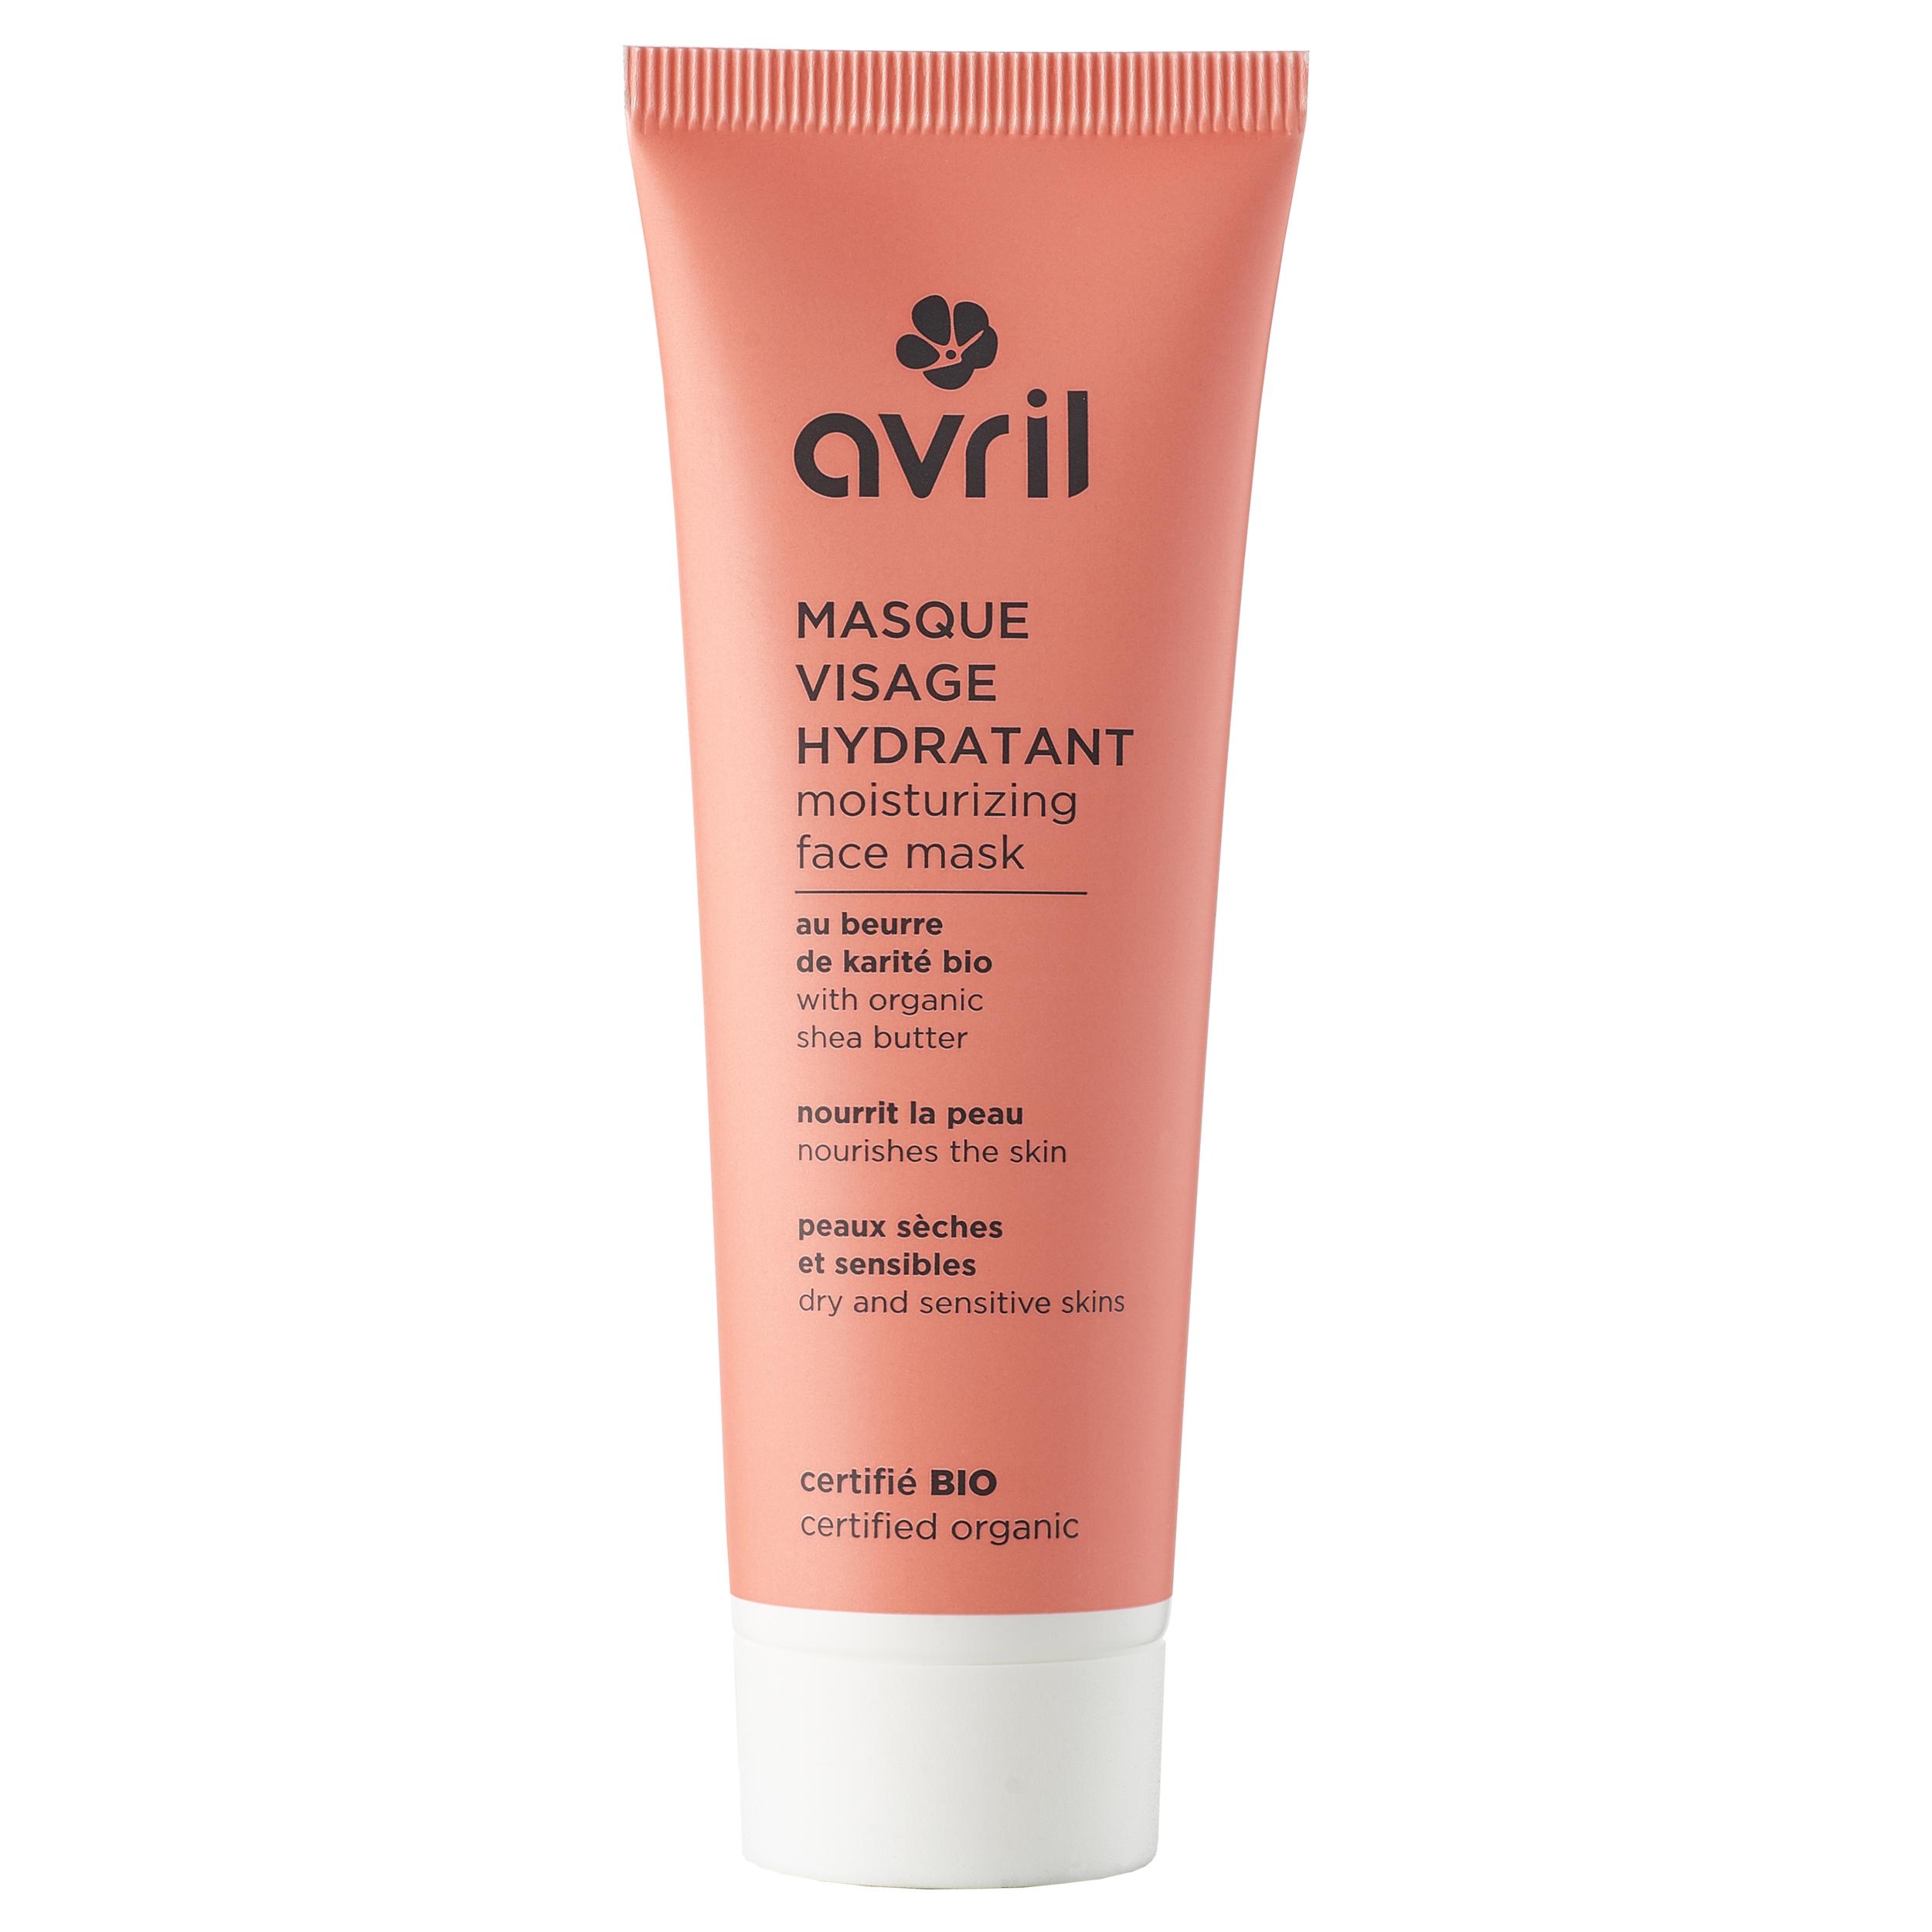 Masque visage hydratant - certifié bio 50 ml